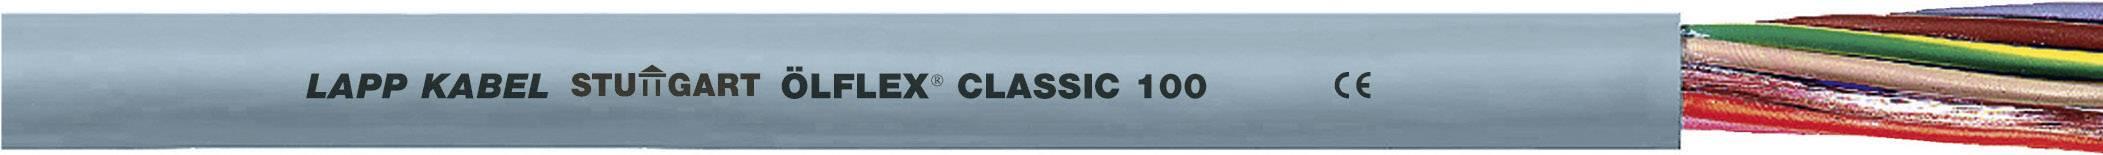 Kabel LappKabel Ölflex CLASSIC 100 2X4 (0010100), PVC, 10,4 mm, 750 V, šedá, 100 m